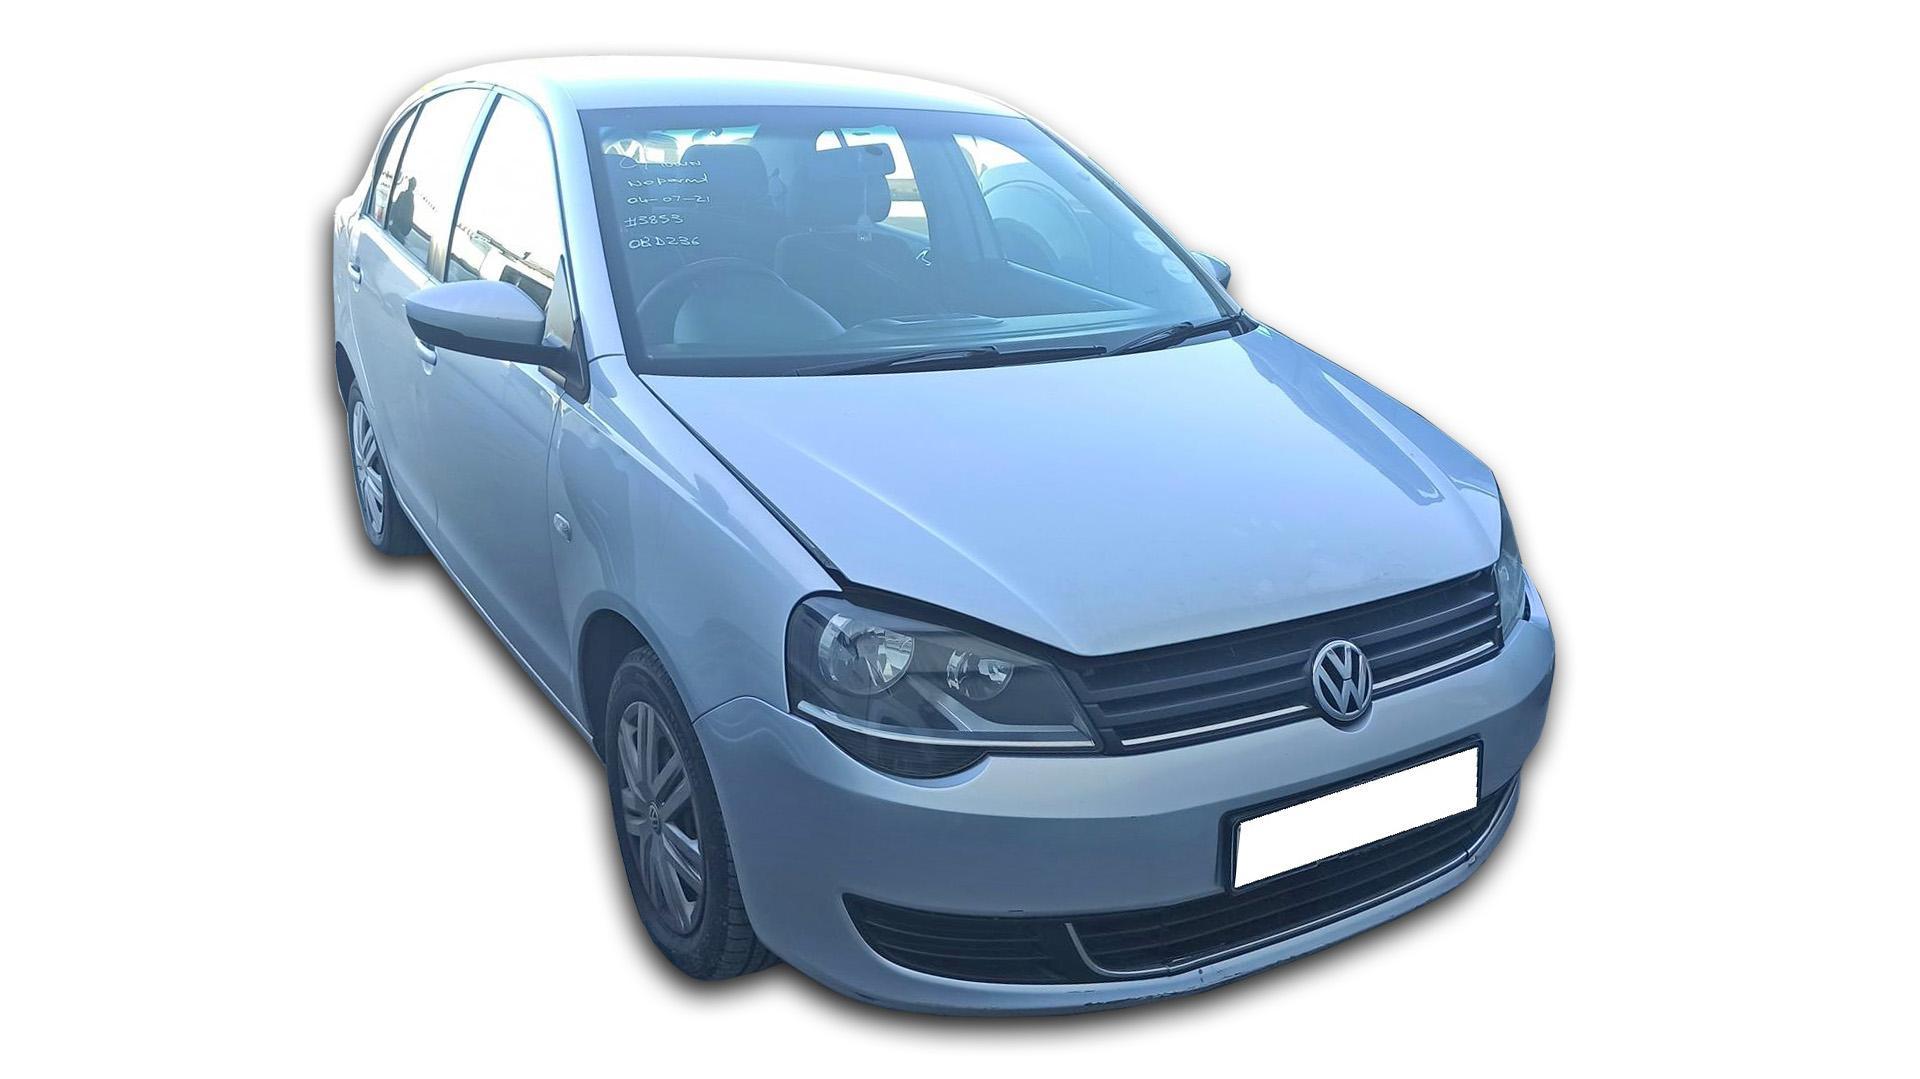 Volkswagen Polo Vivo GP 1.4 TR